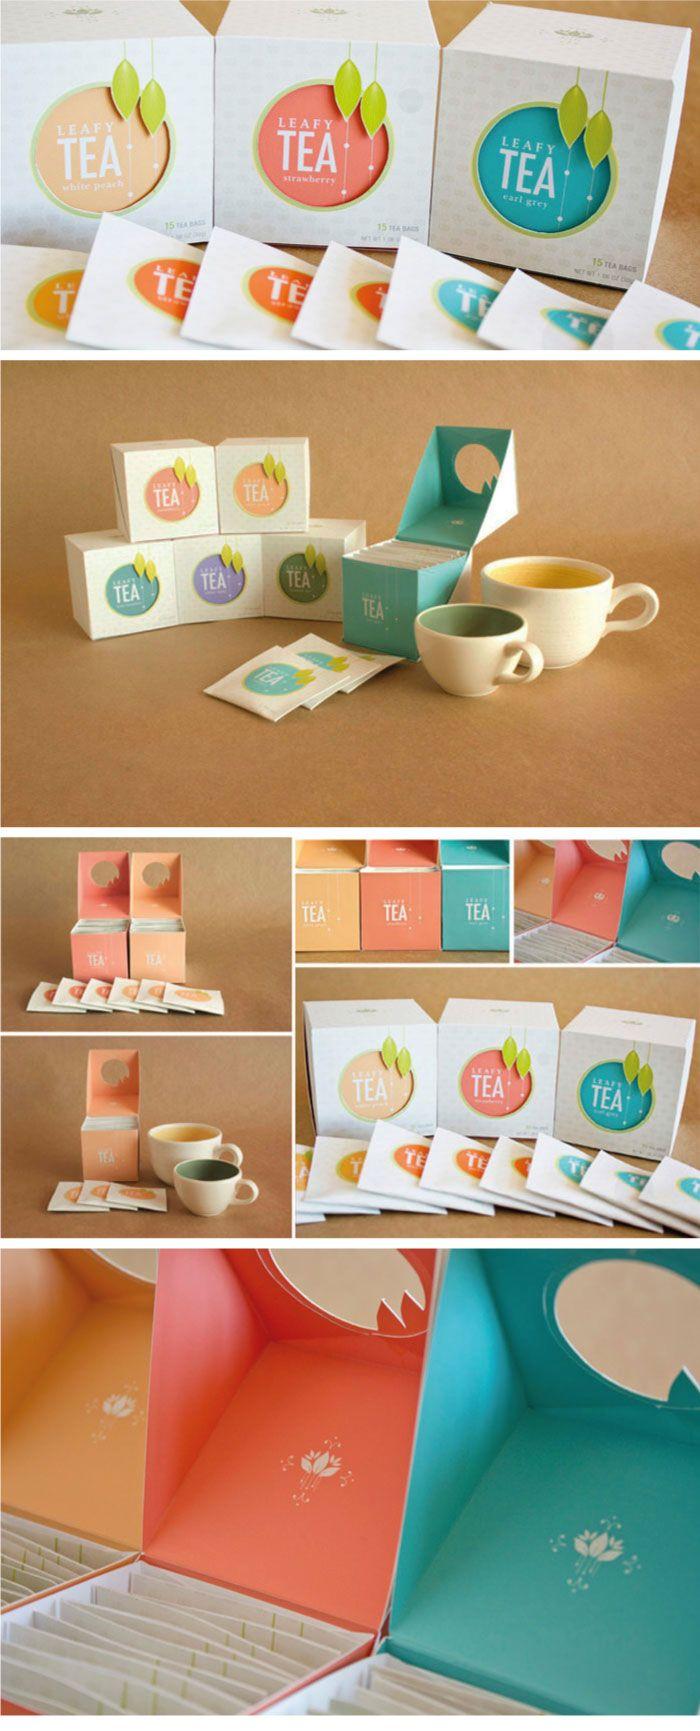 a cute packaging design for tea